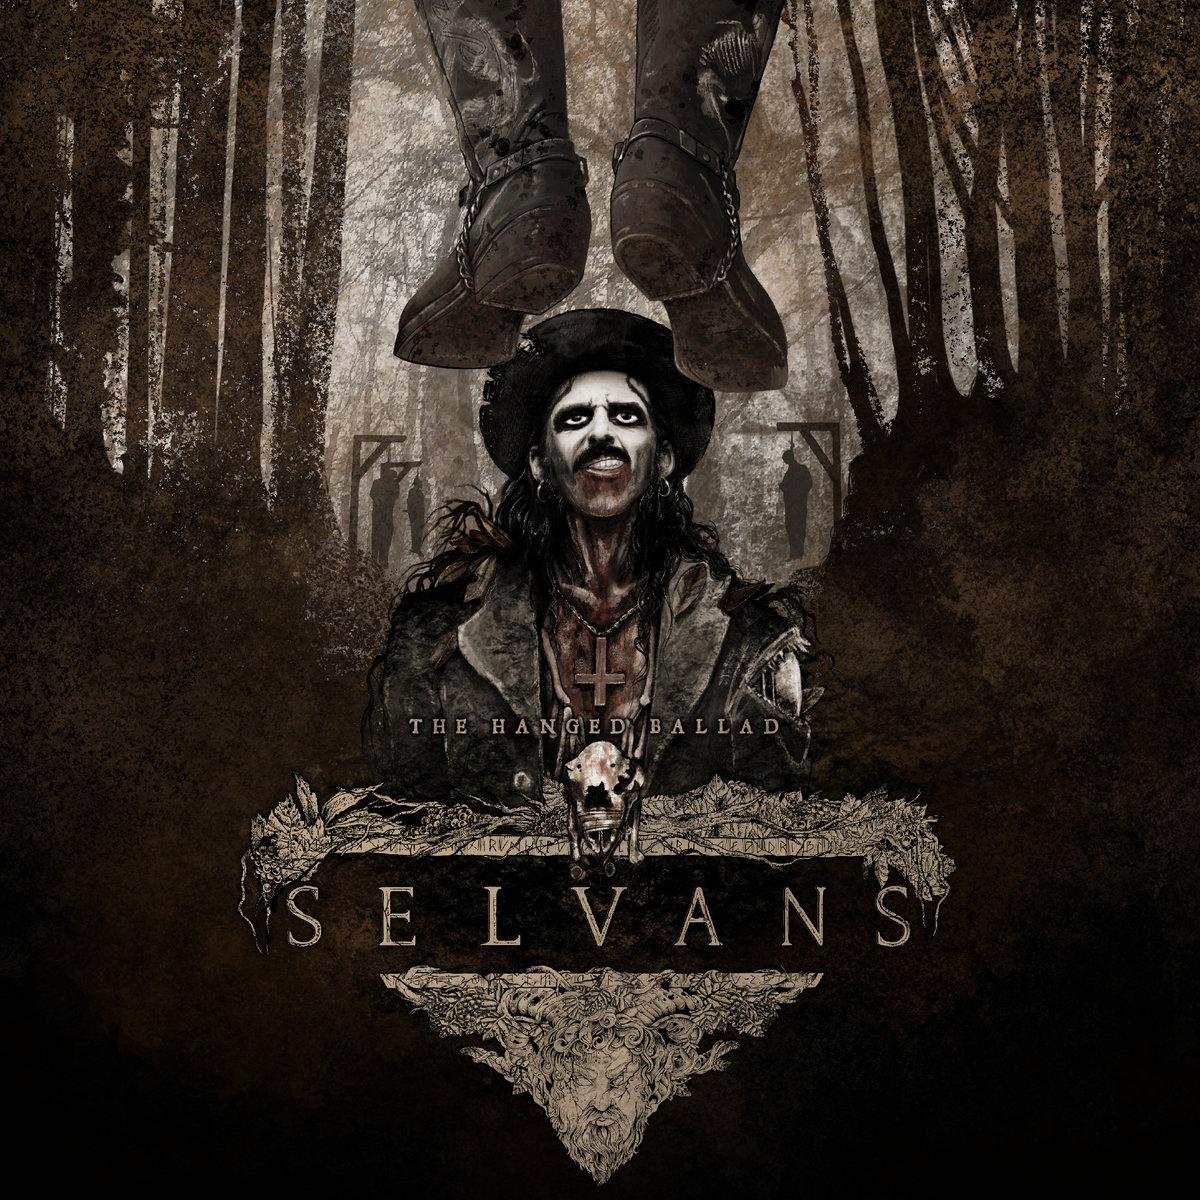 Selvans The Hanged Ballad Cover Art